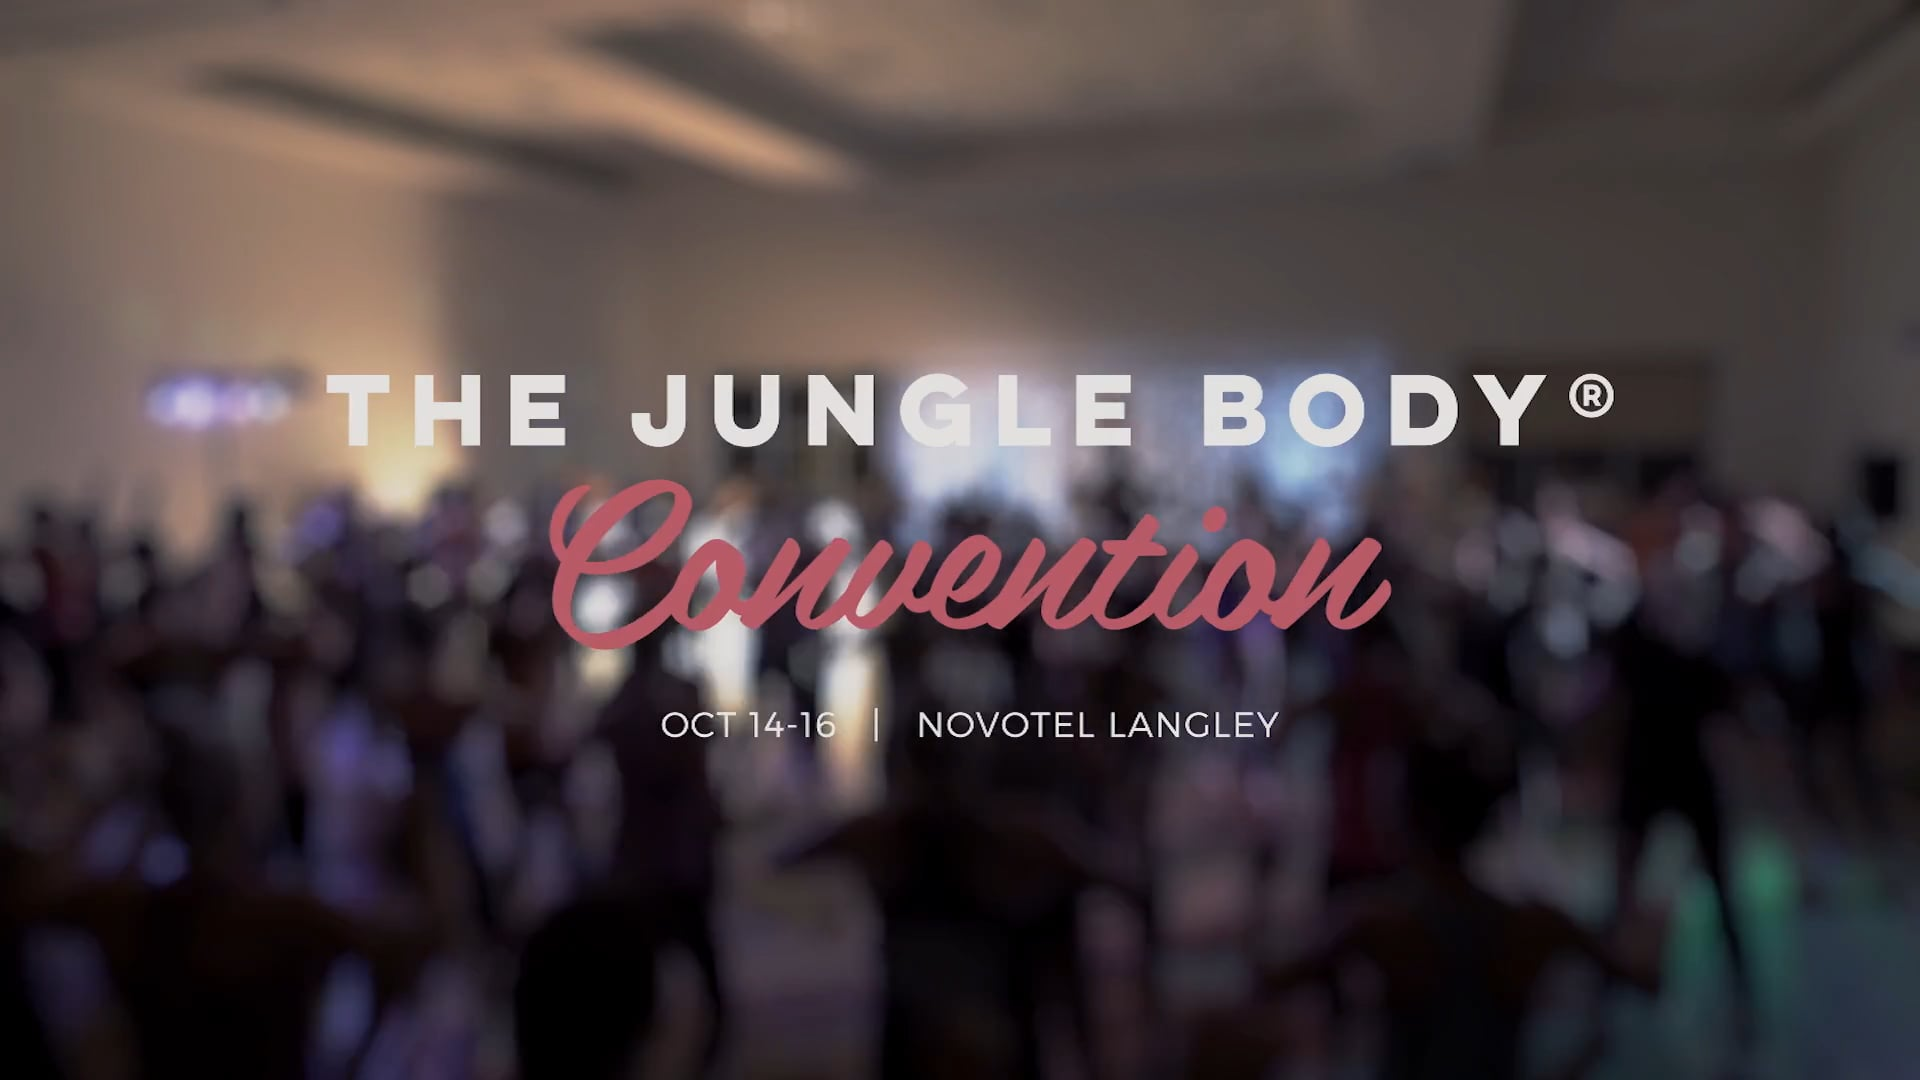 The Jungle Body Convention 2016